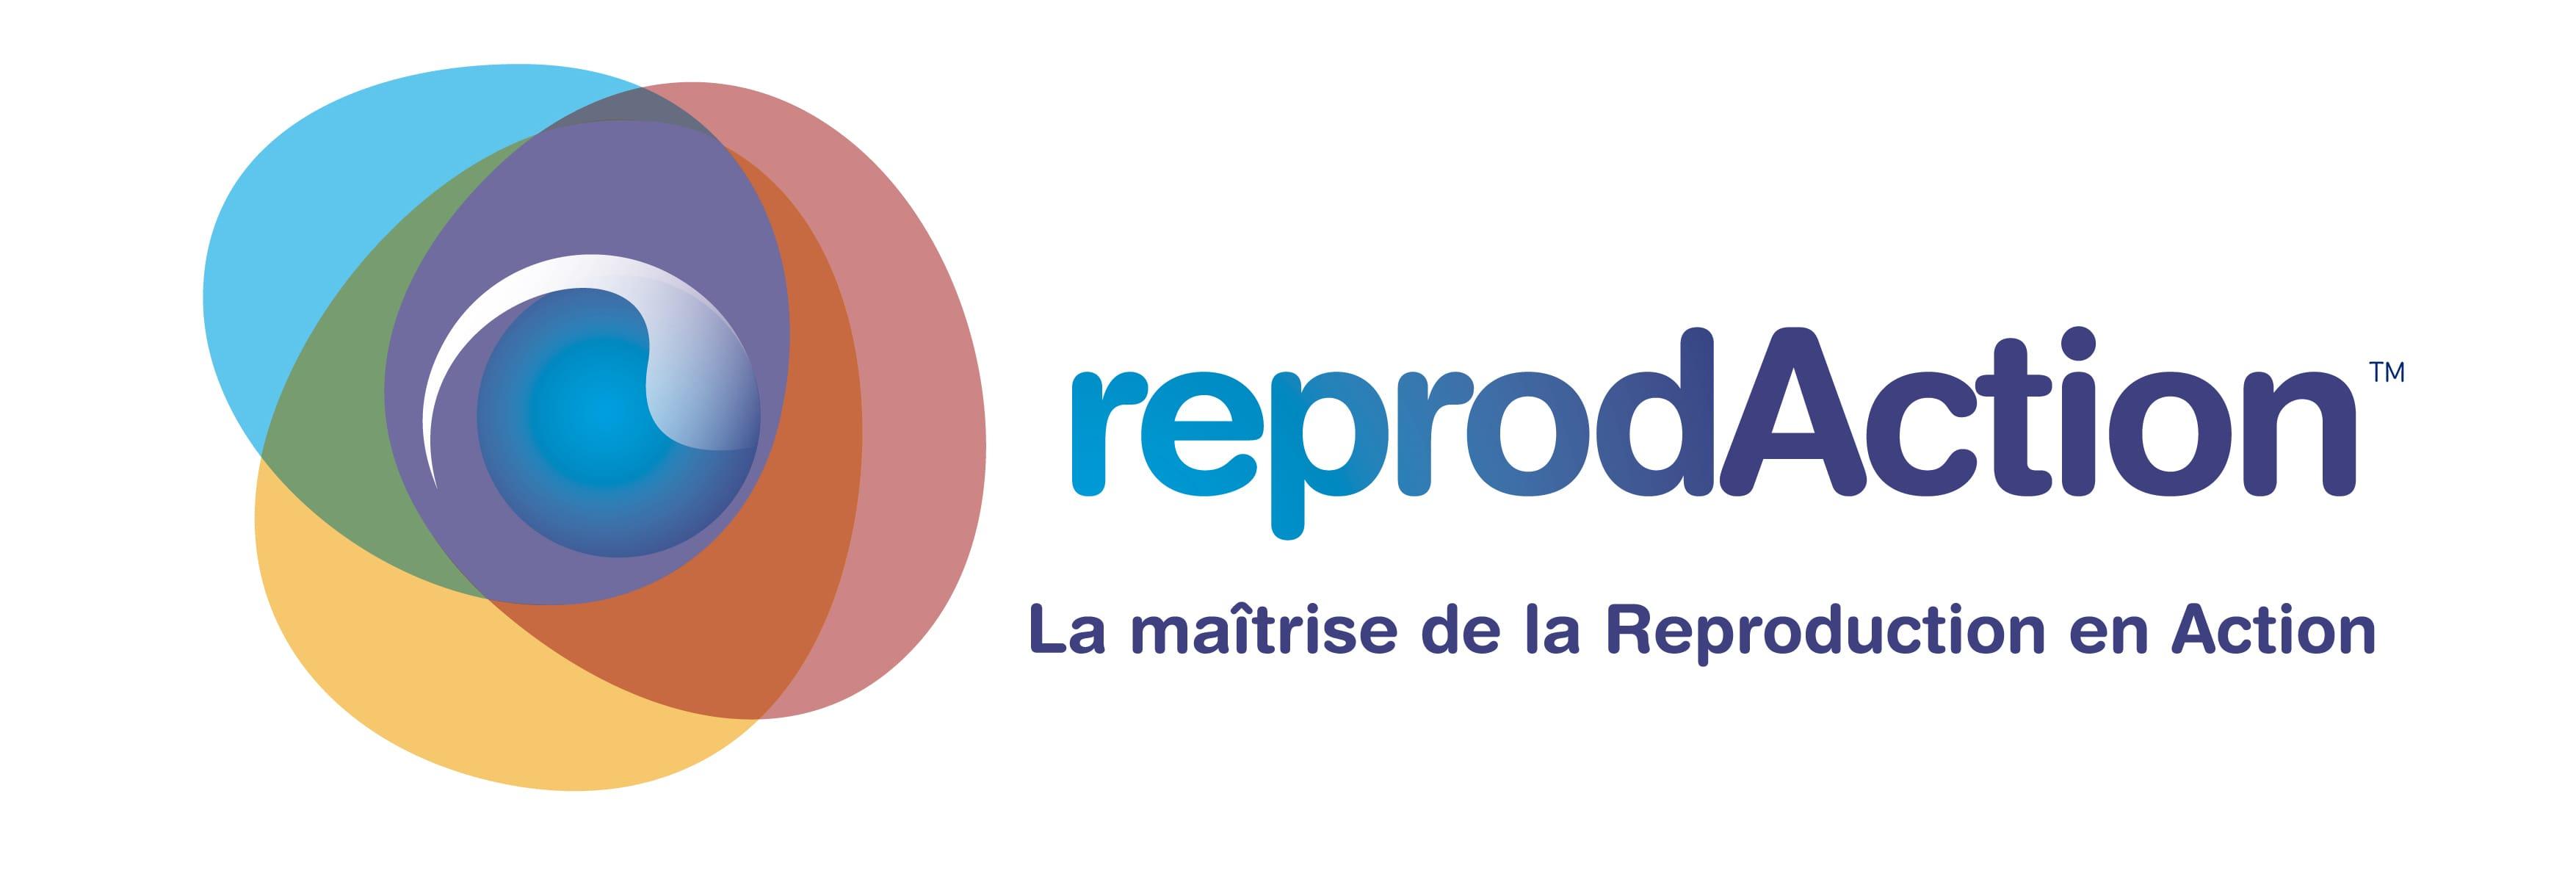 Reprodaction